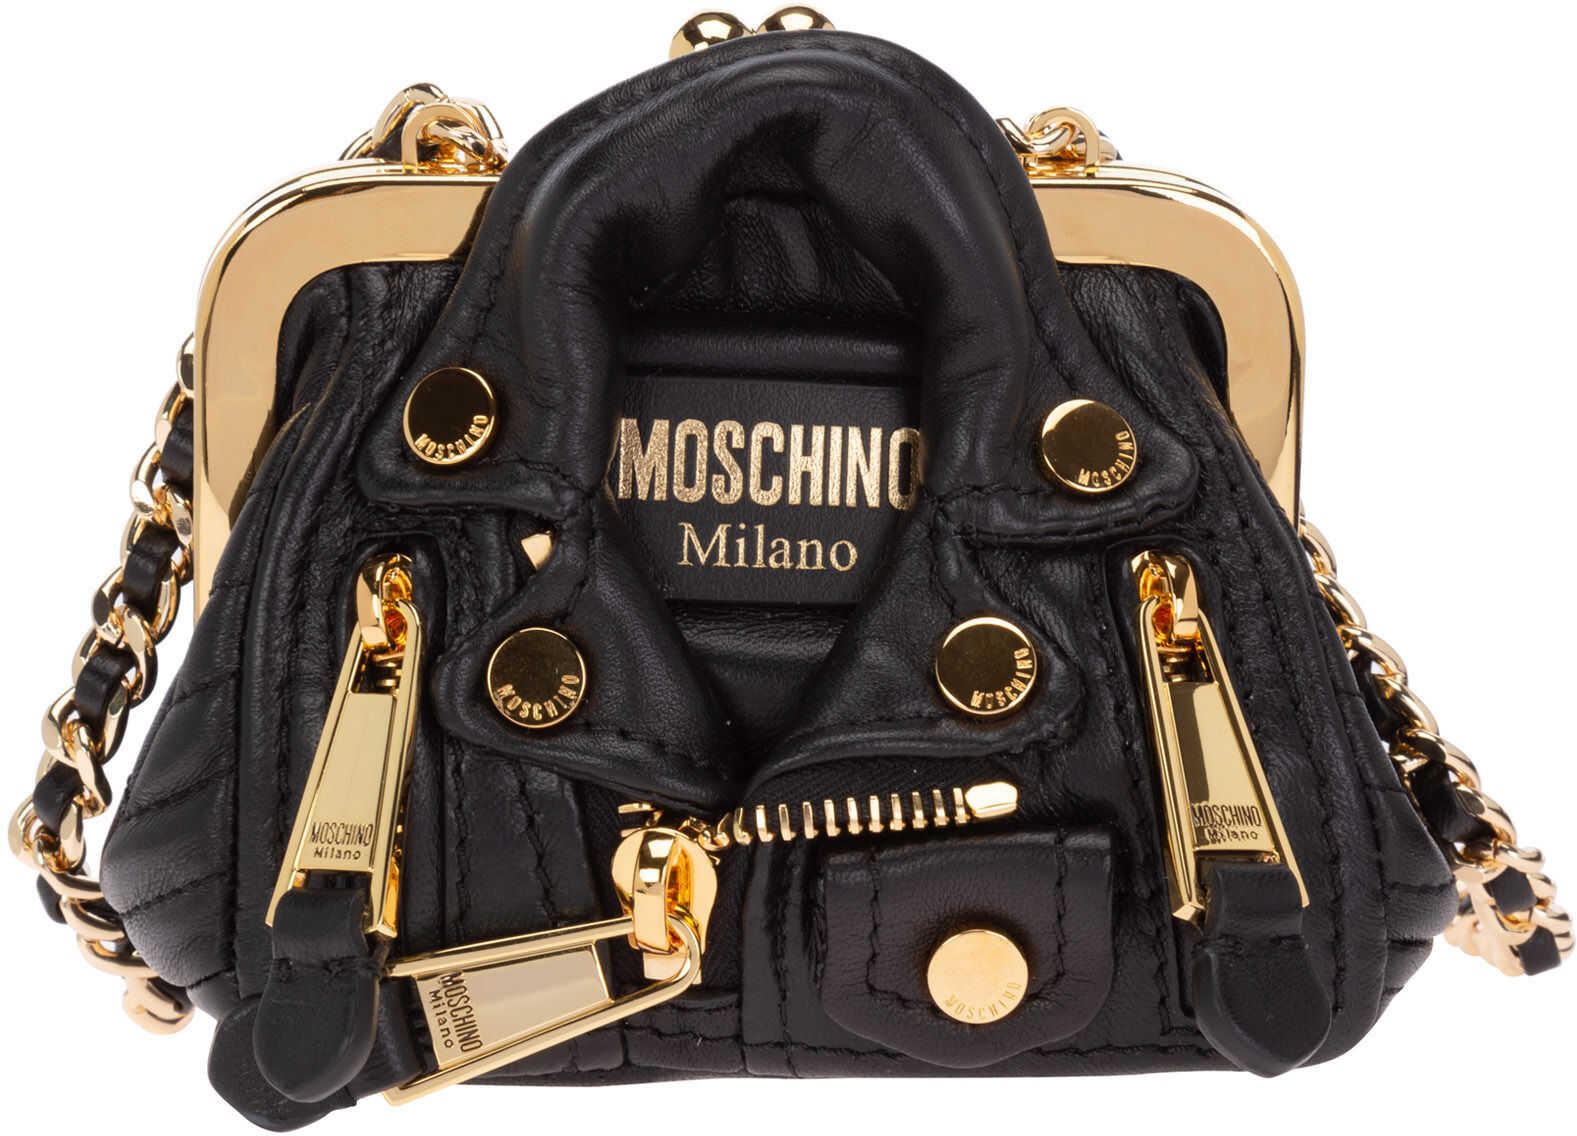 Moschino Shoulder Bag A748680021555 Black imagine b-mall.ro